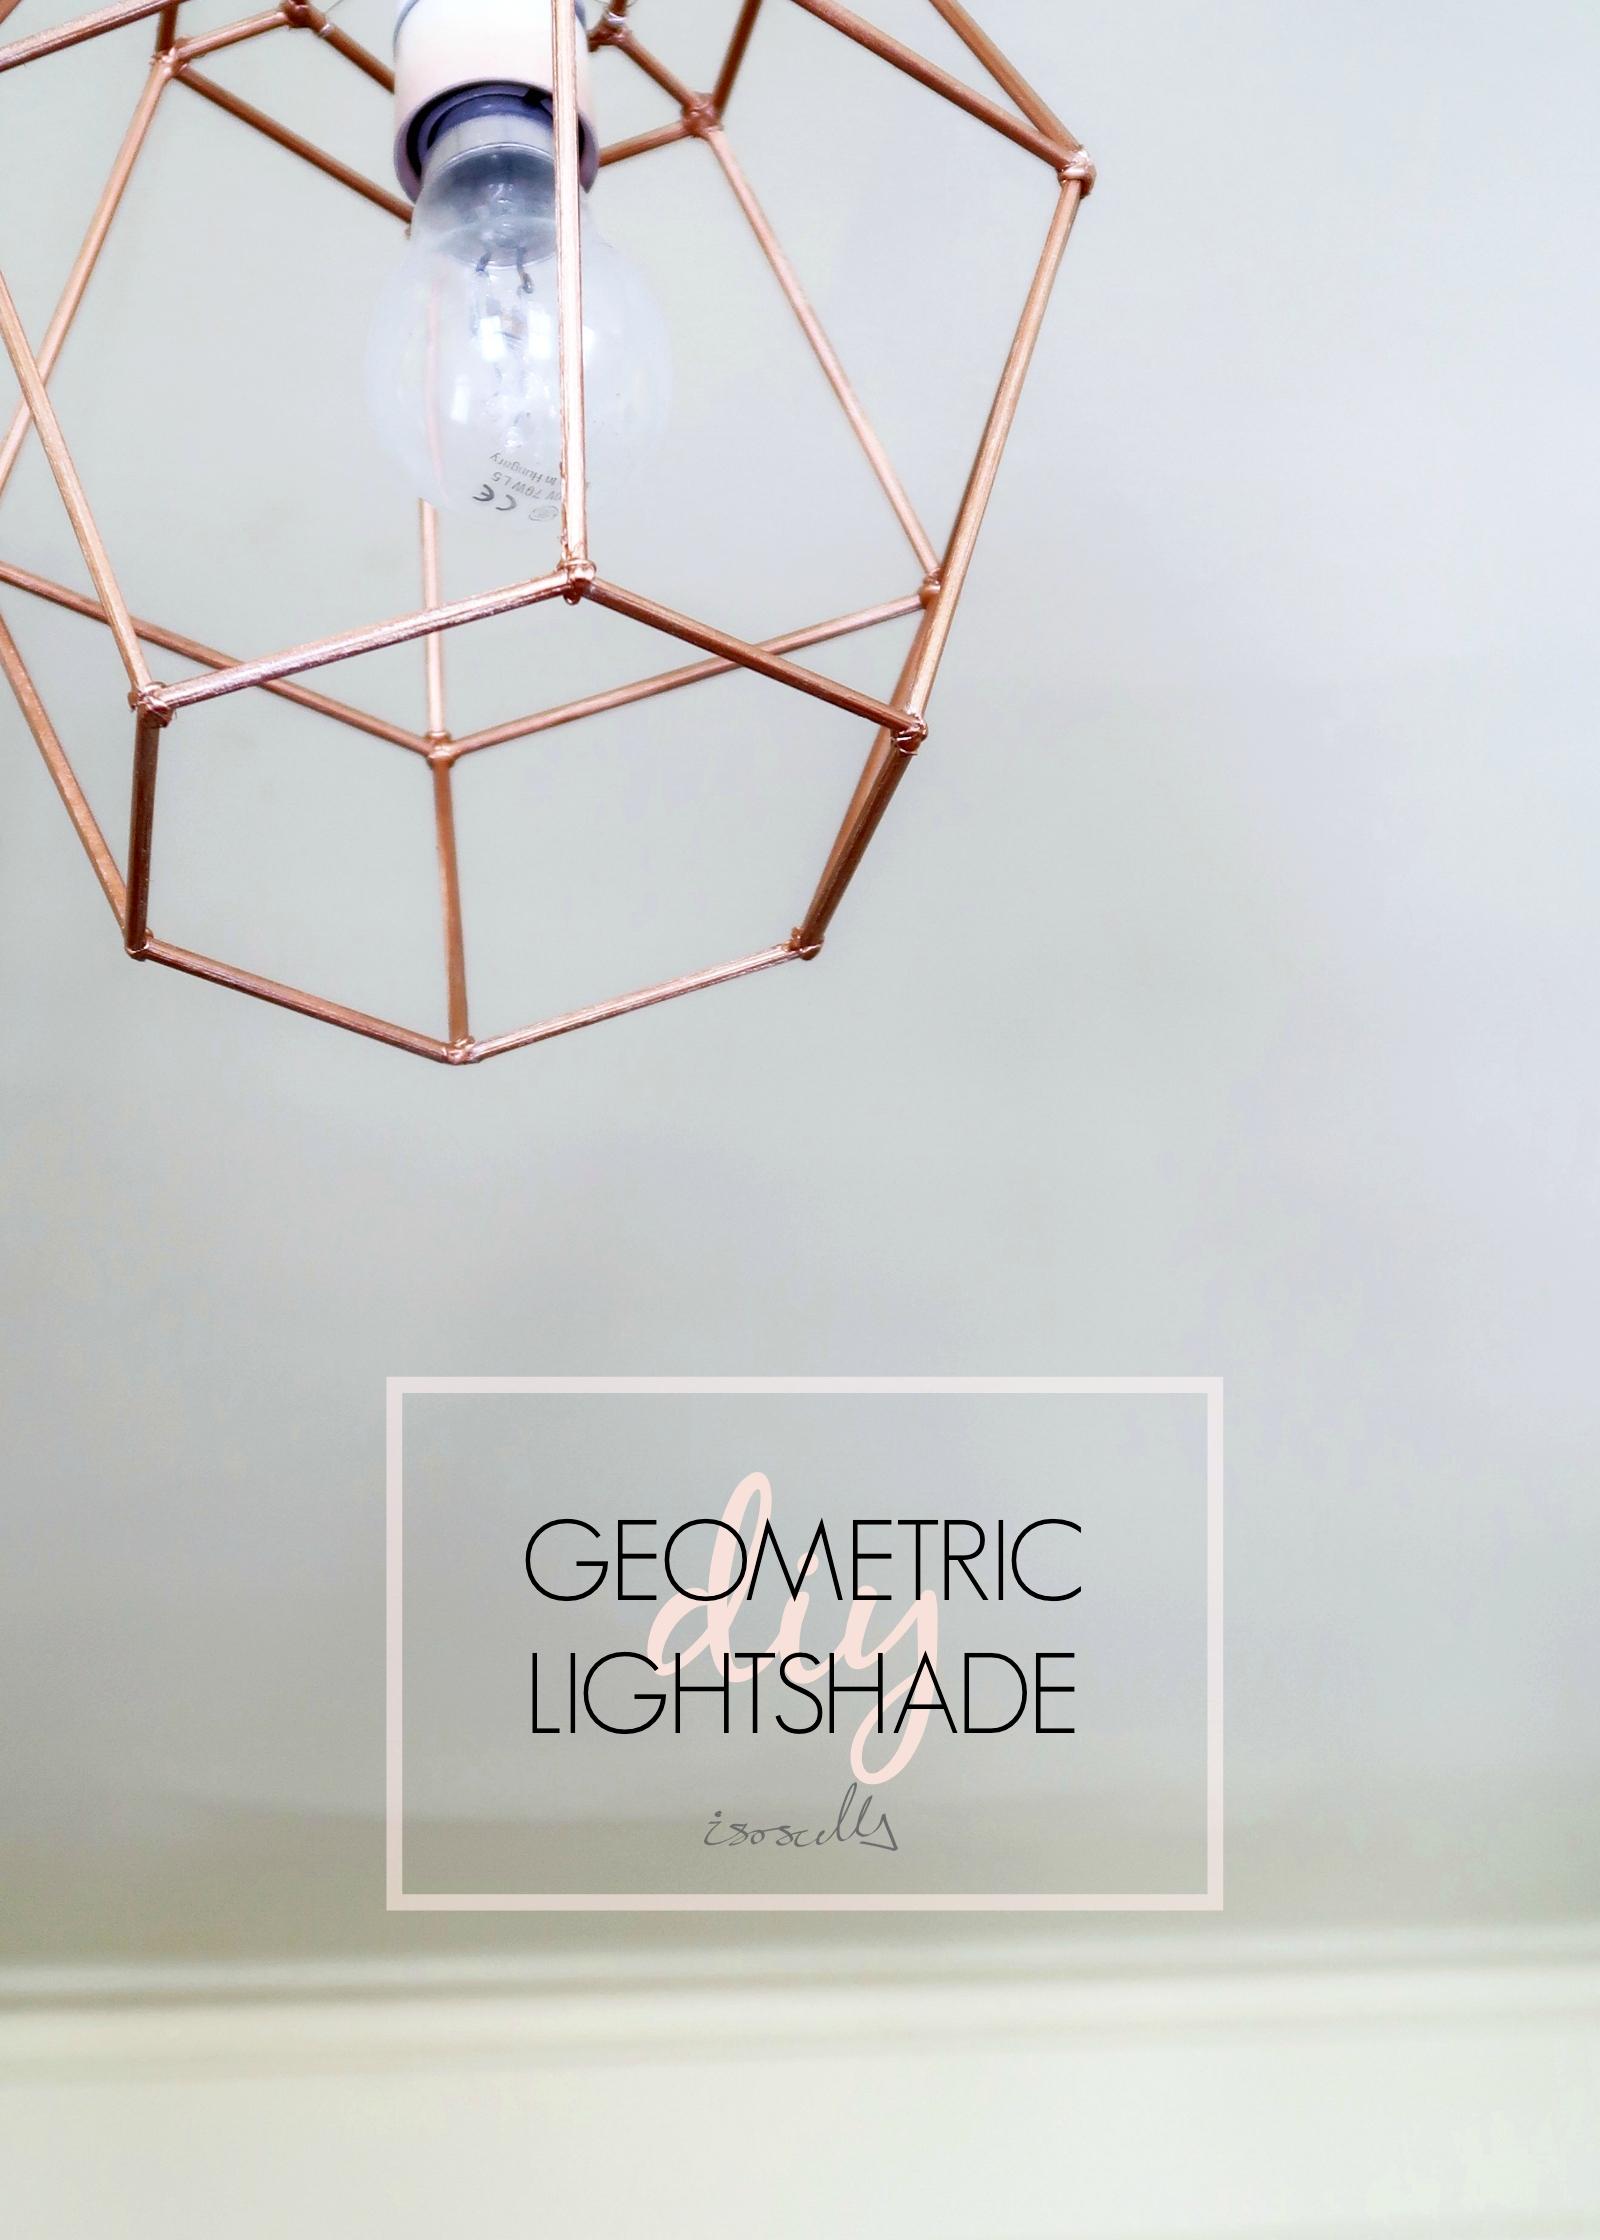 DIY Geometric Light Shade by Isoscella